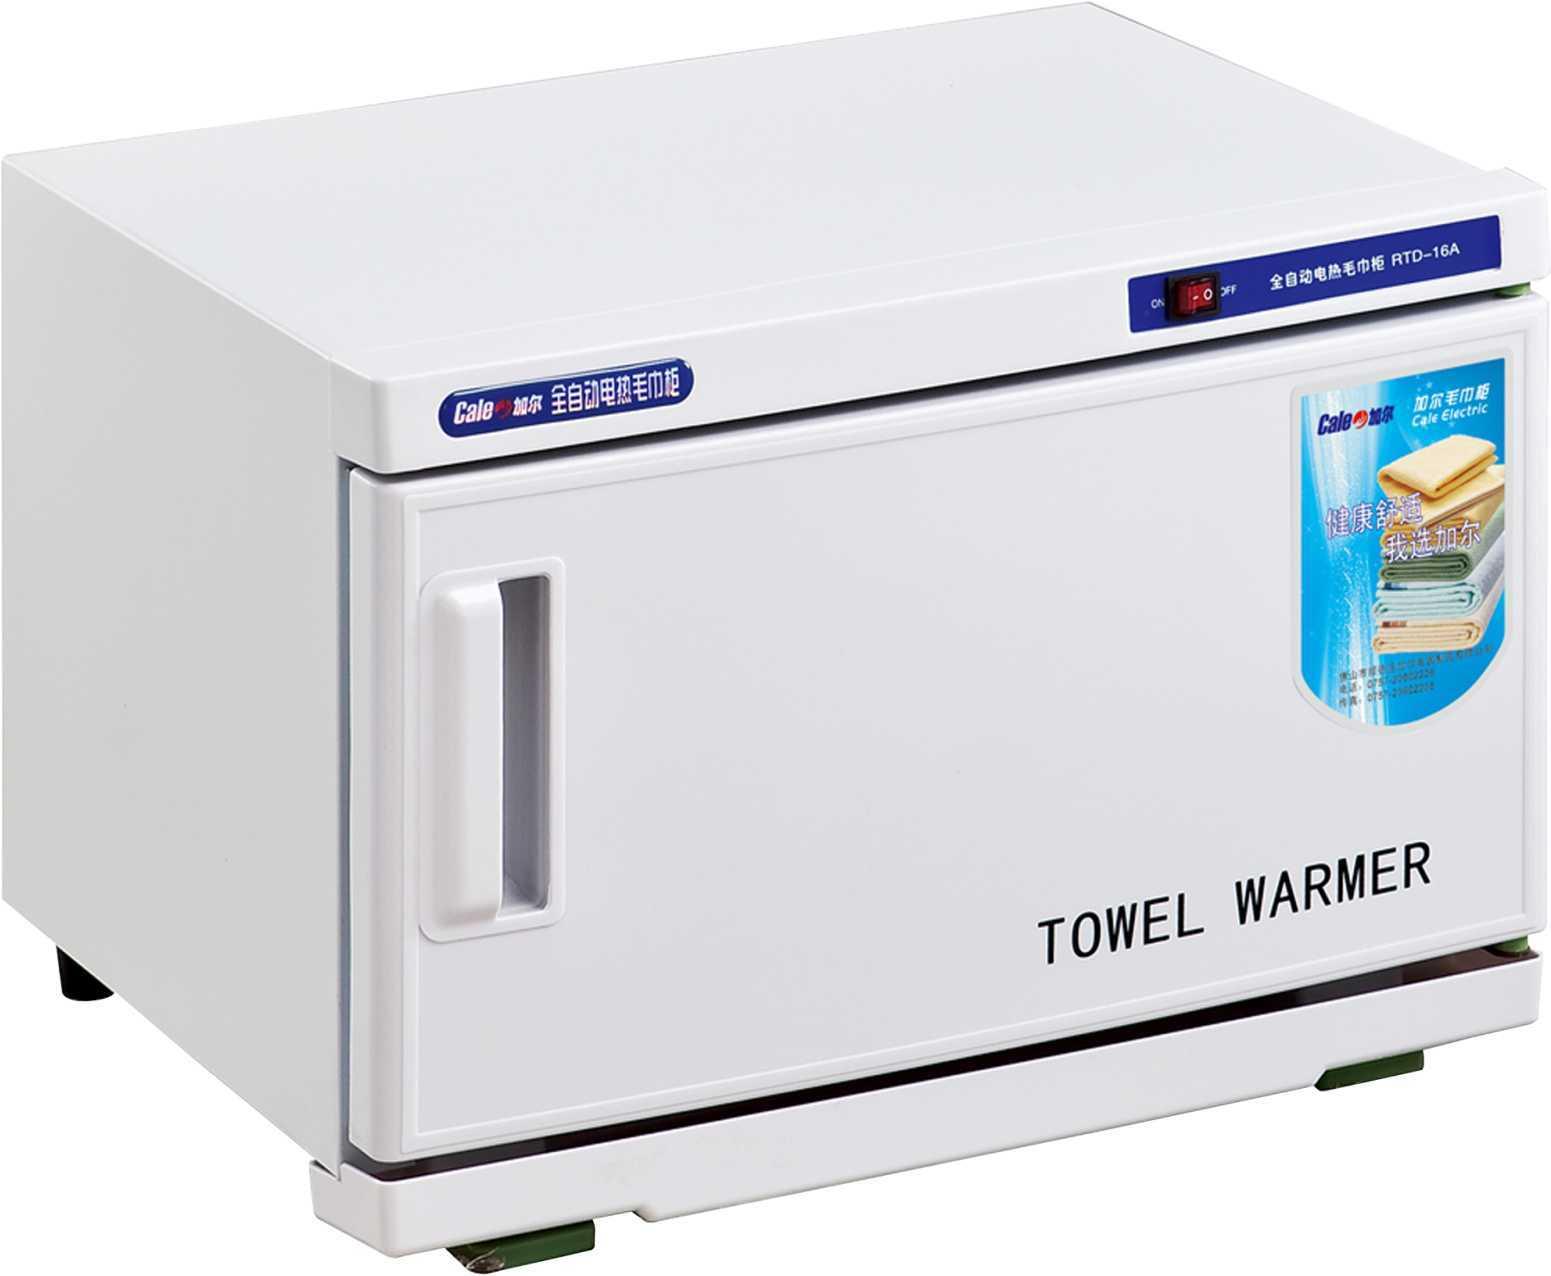 16A Towel Warmer for Salon Equipment (DN. 9116 A)